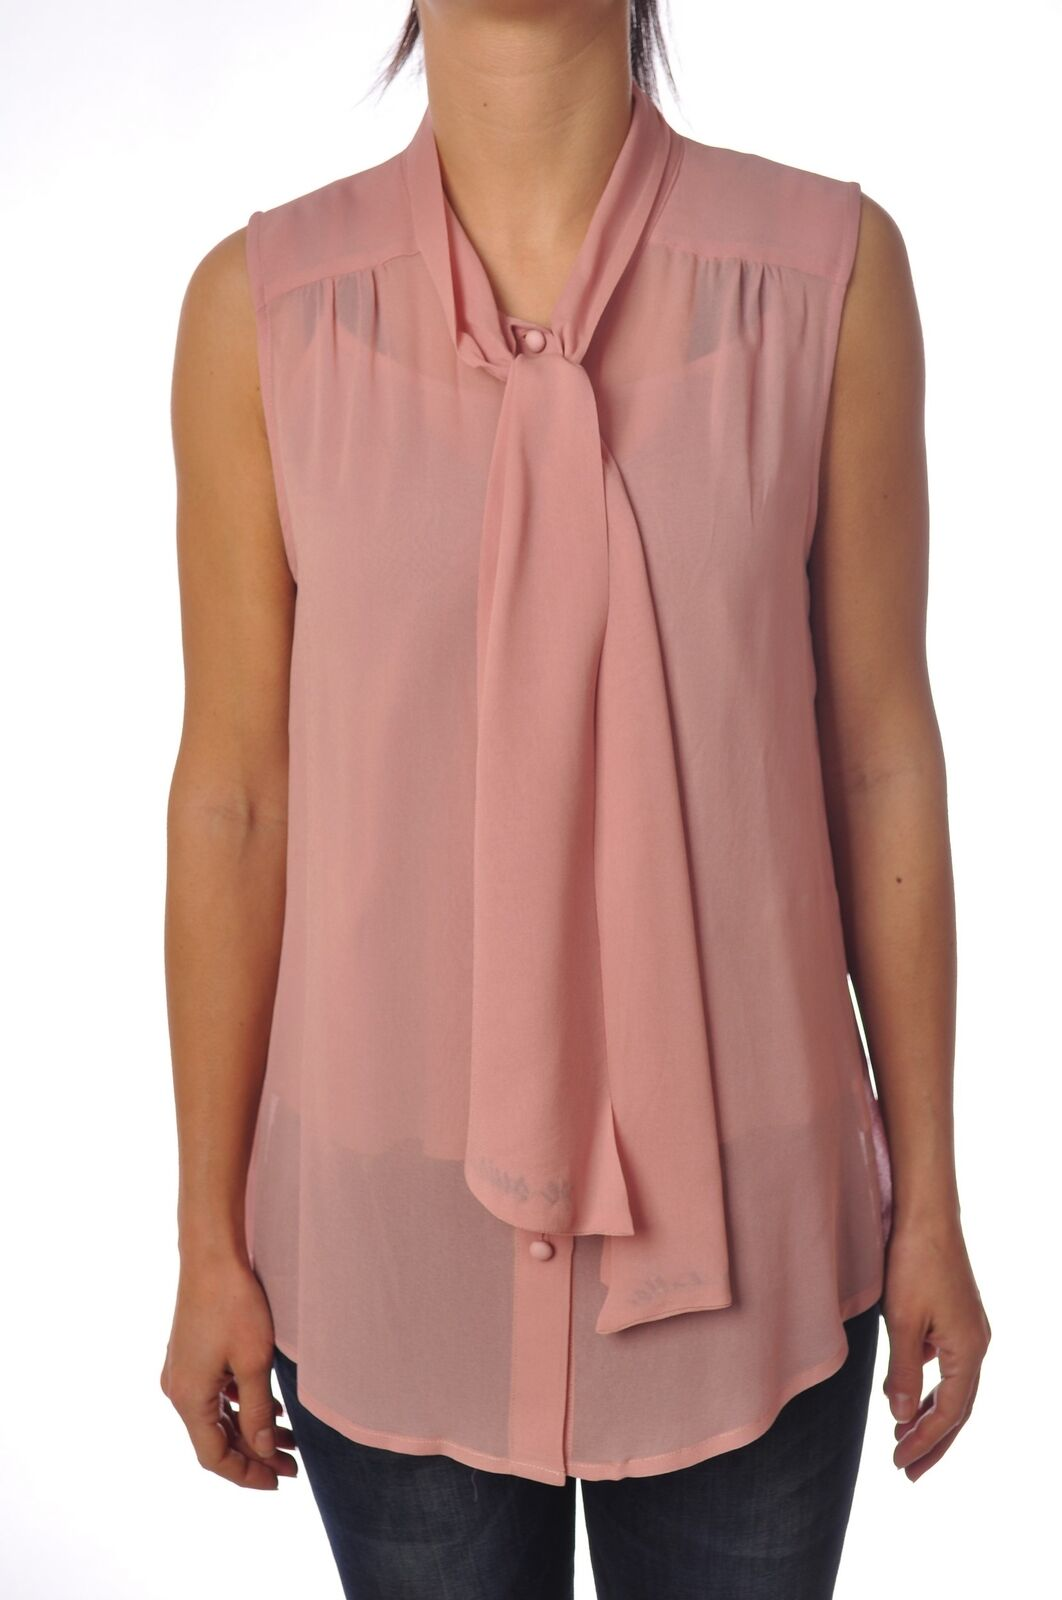 Ottod'ame - Shirts-Blouses - Woman - Pink - 4930310E191042